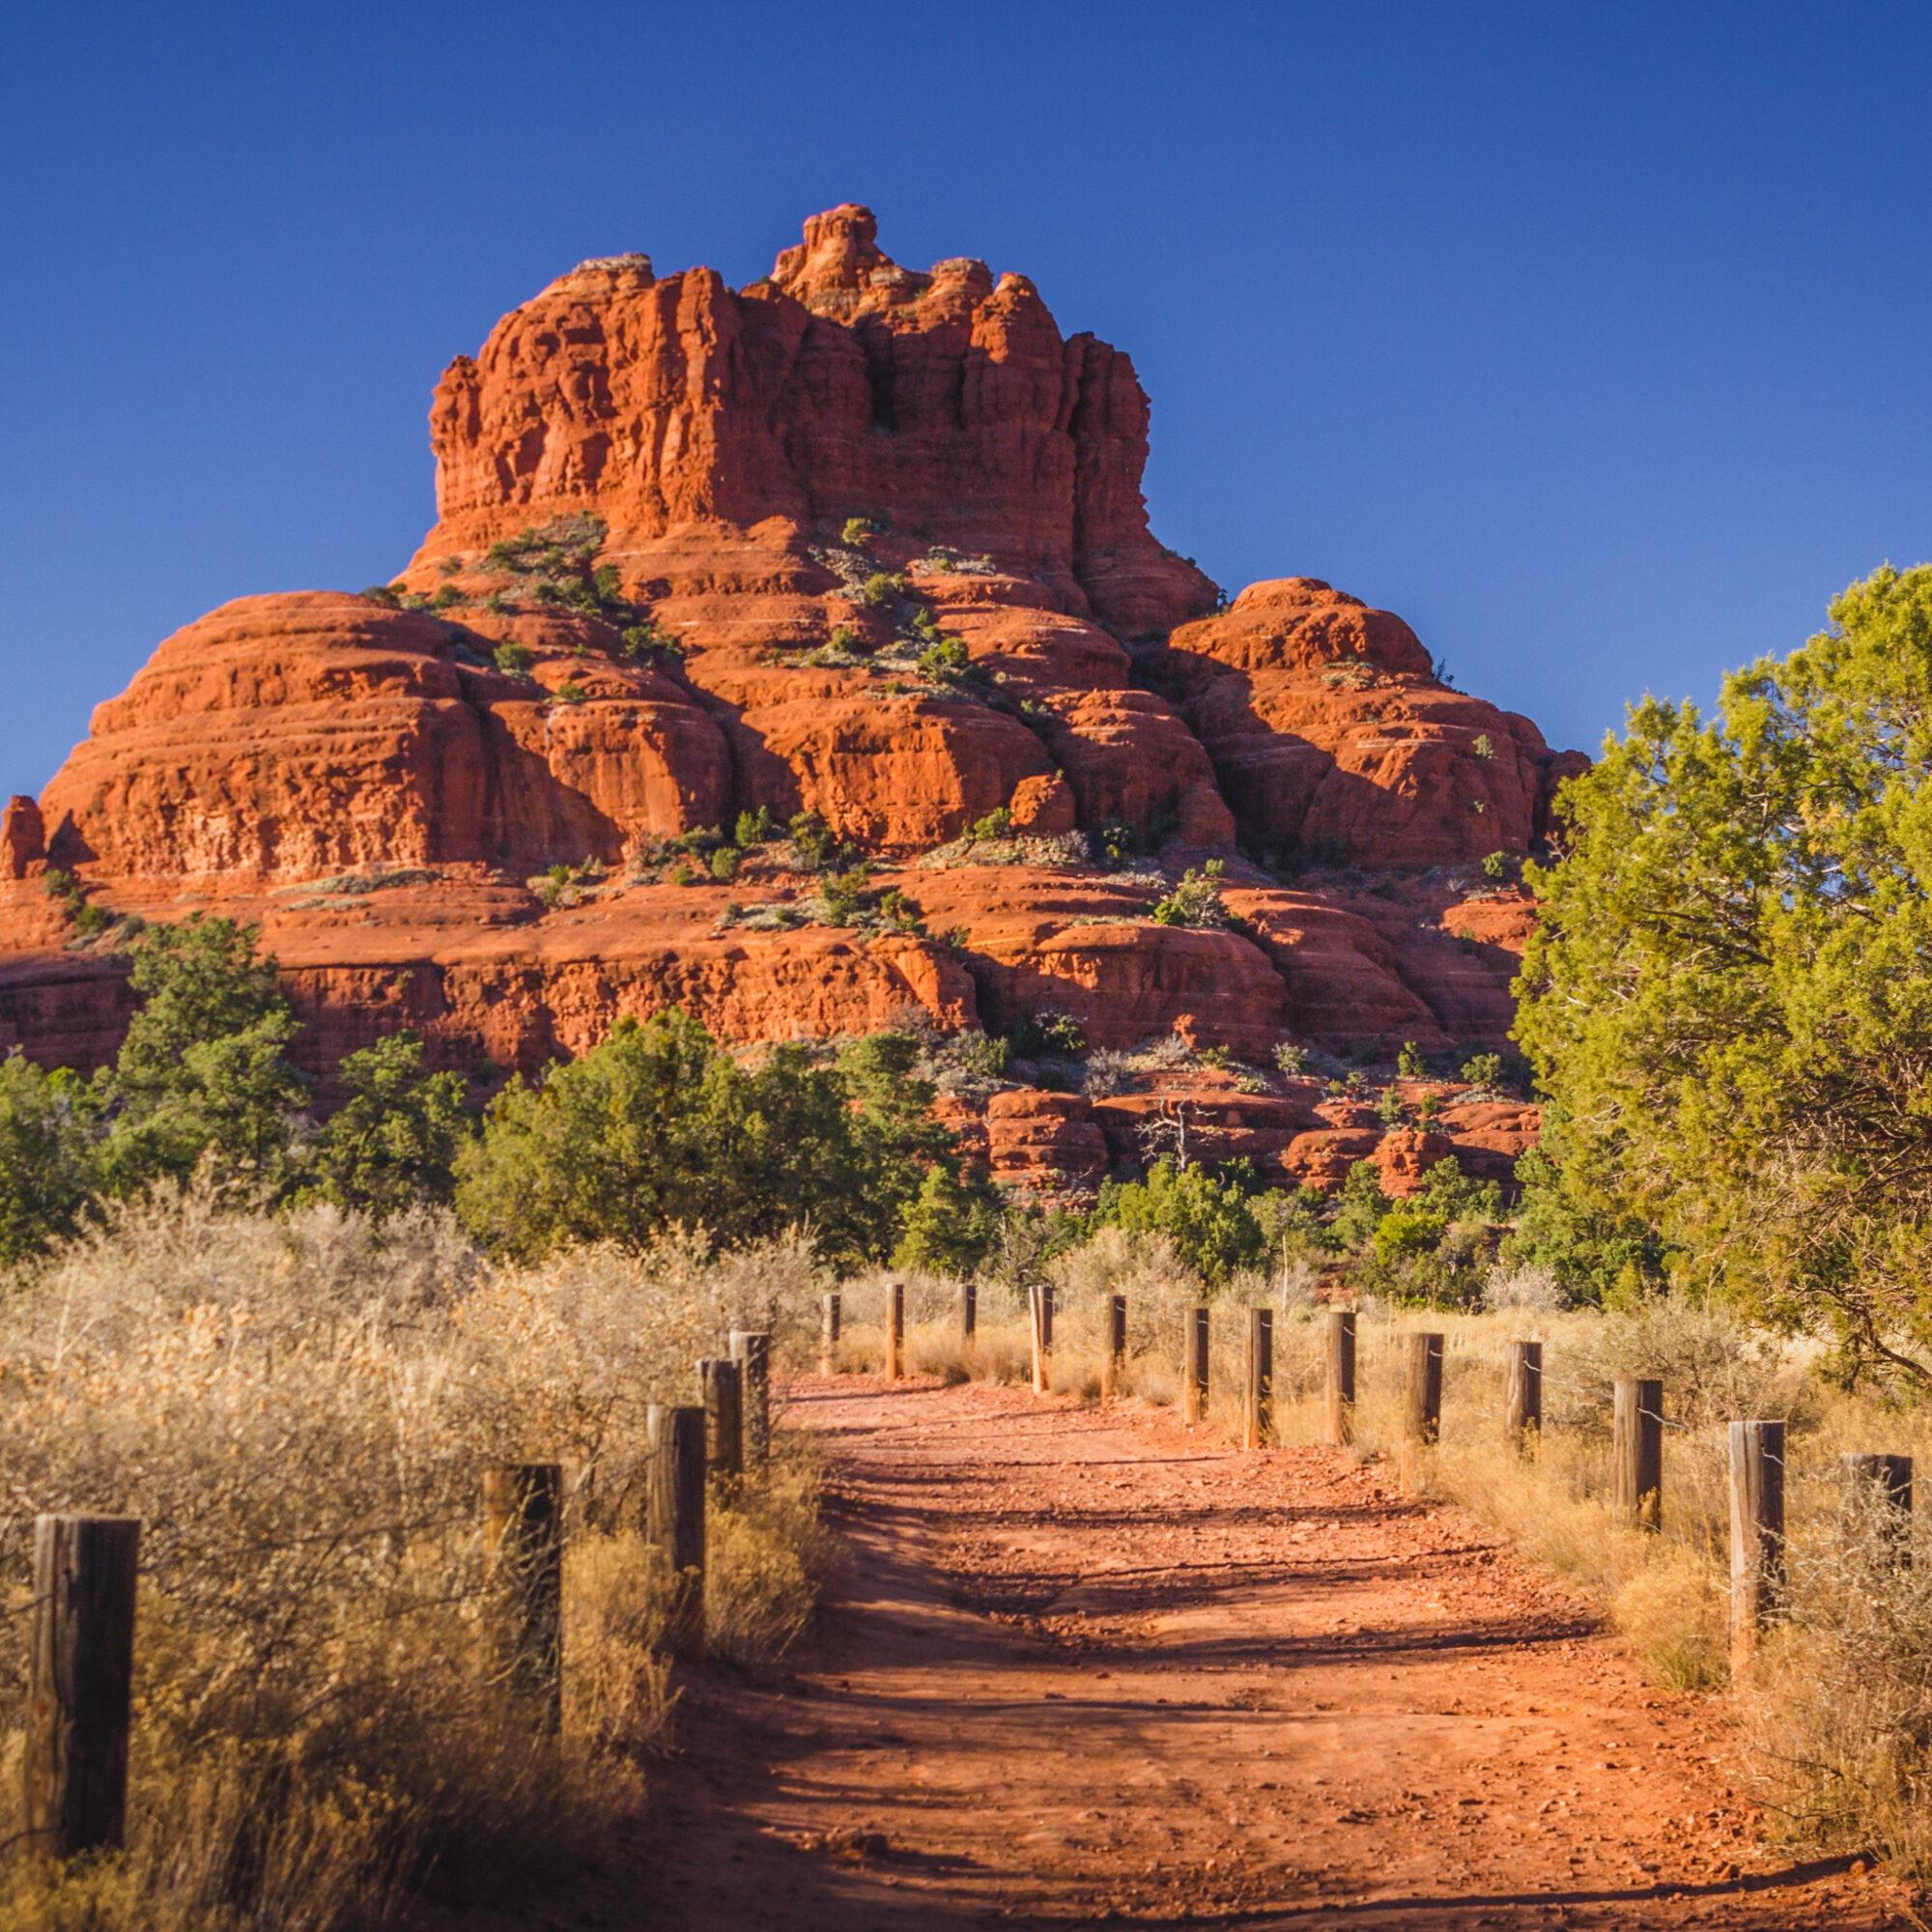 Bell Rock, a popular vortex spot in Sedona, Arizona.